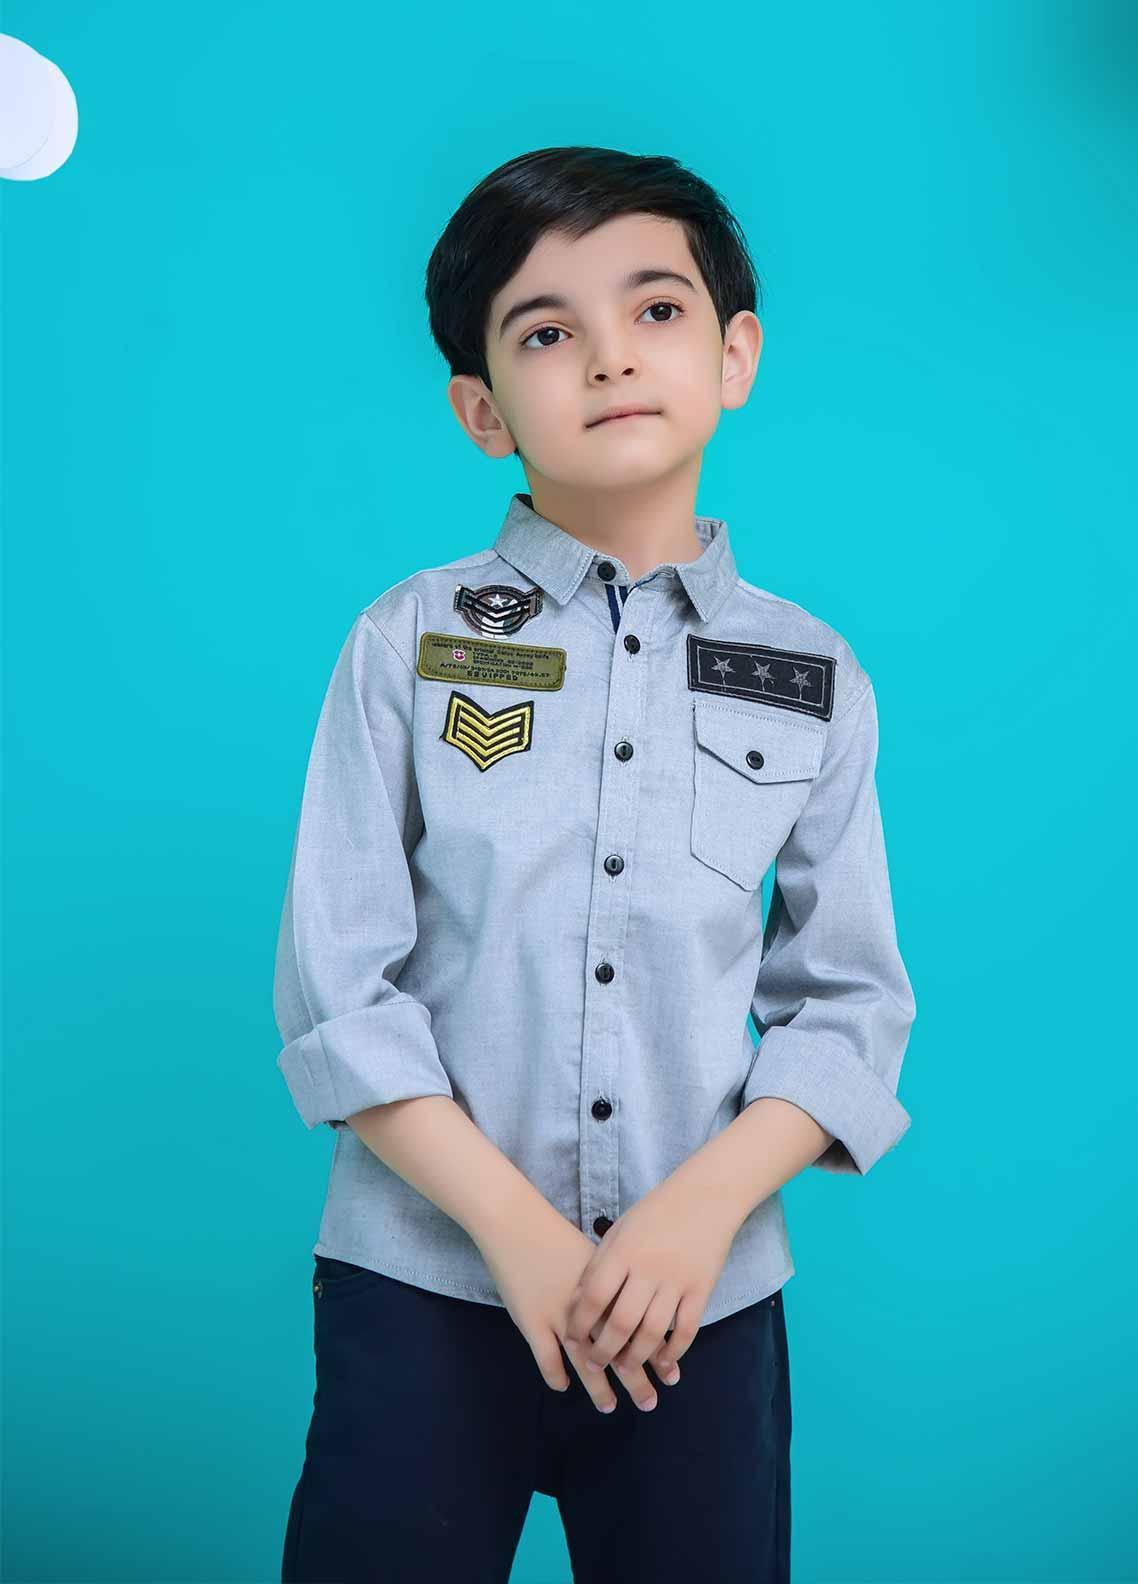 Ochre Cotton Casual Boys Shirts -  OBS 09 Grey